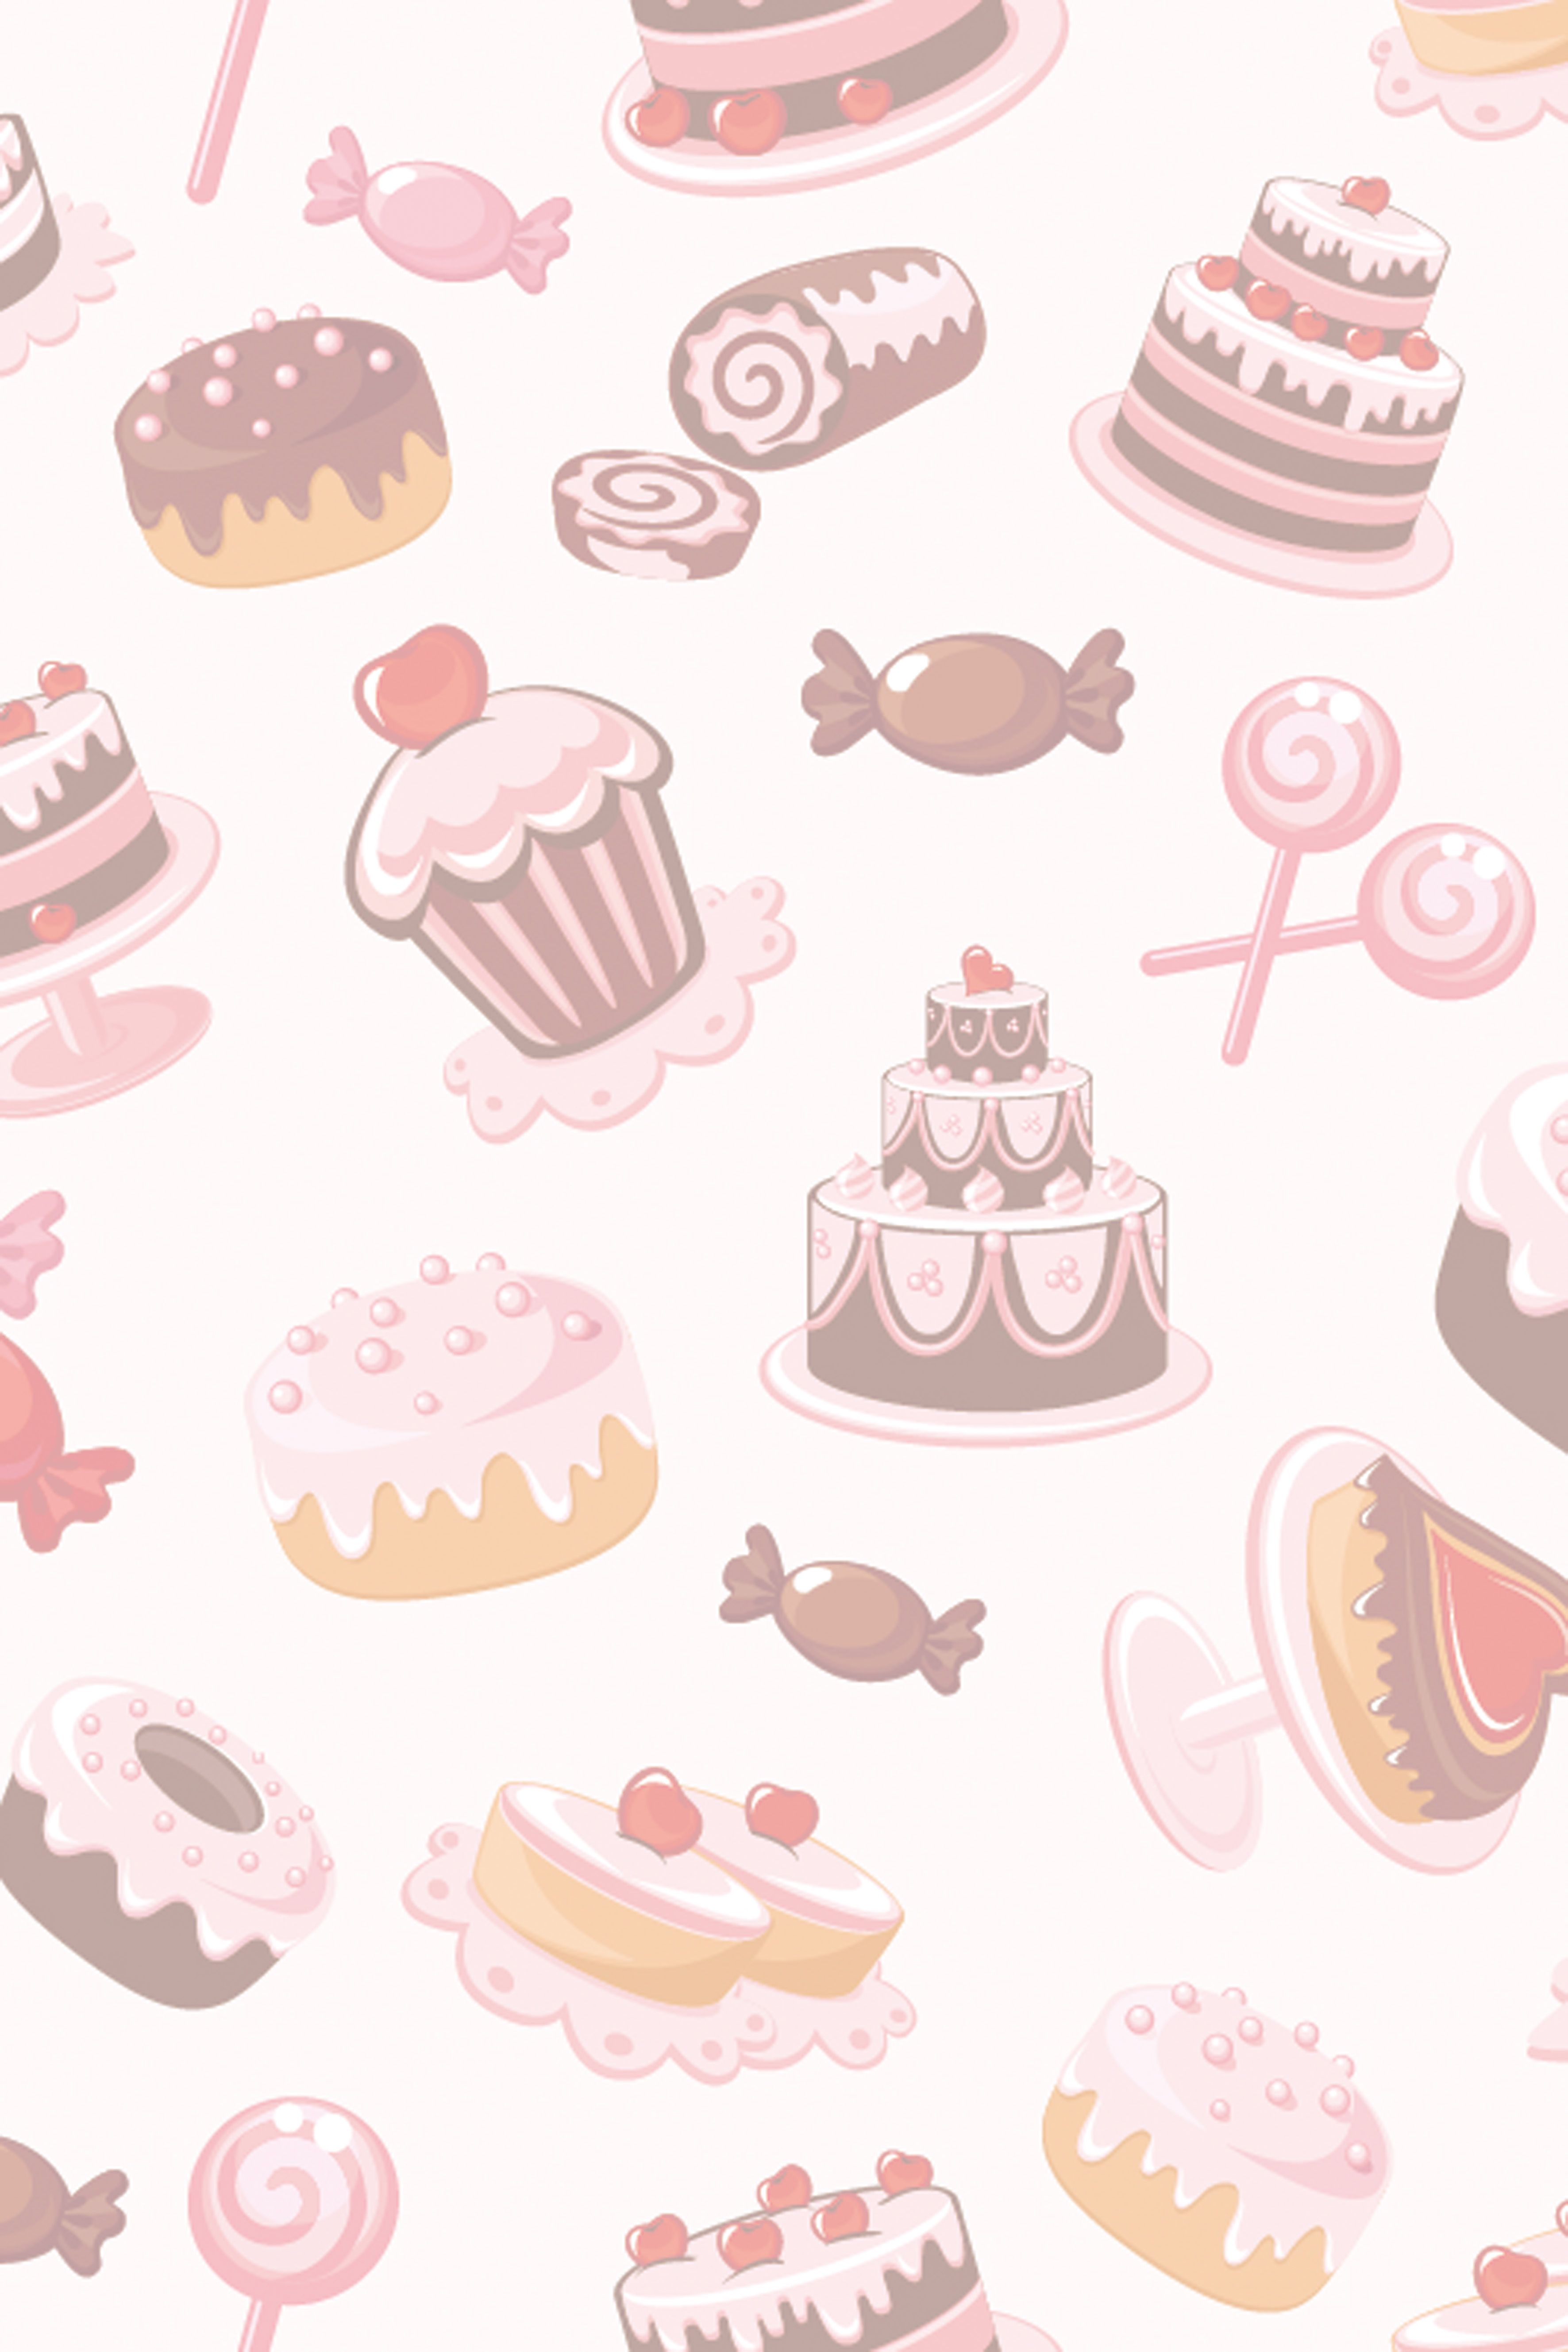 Background rev rie in. Dessert clipart wallpaper